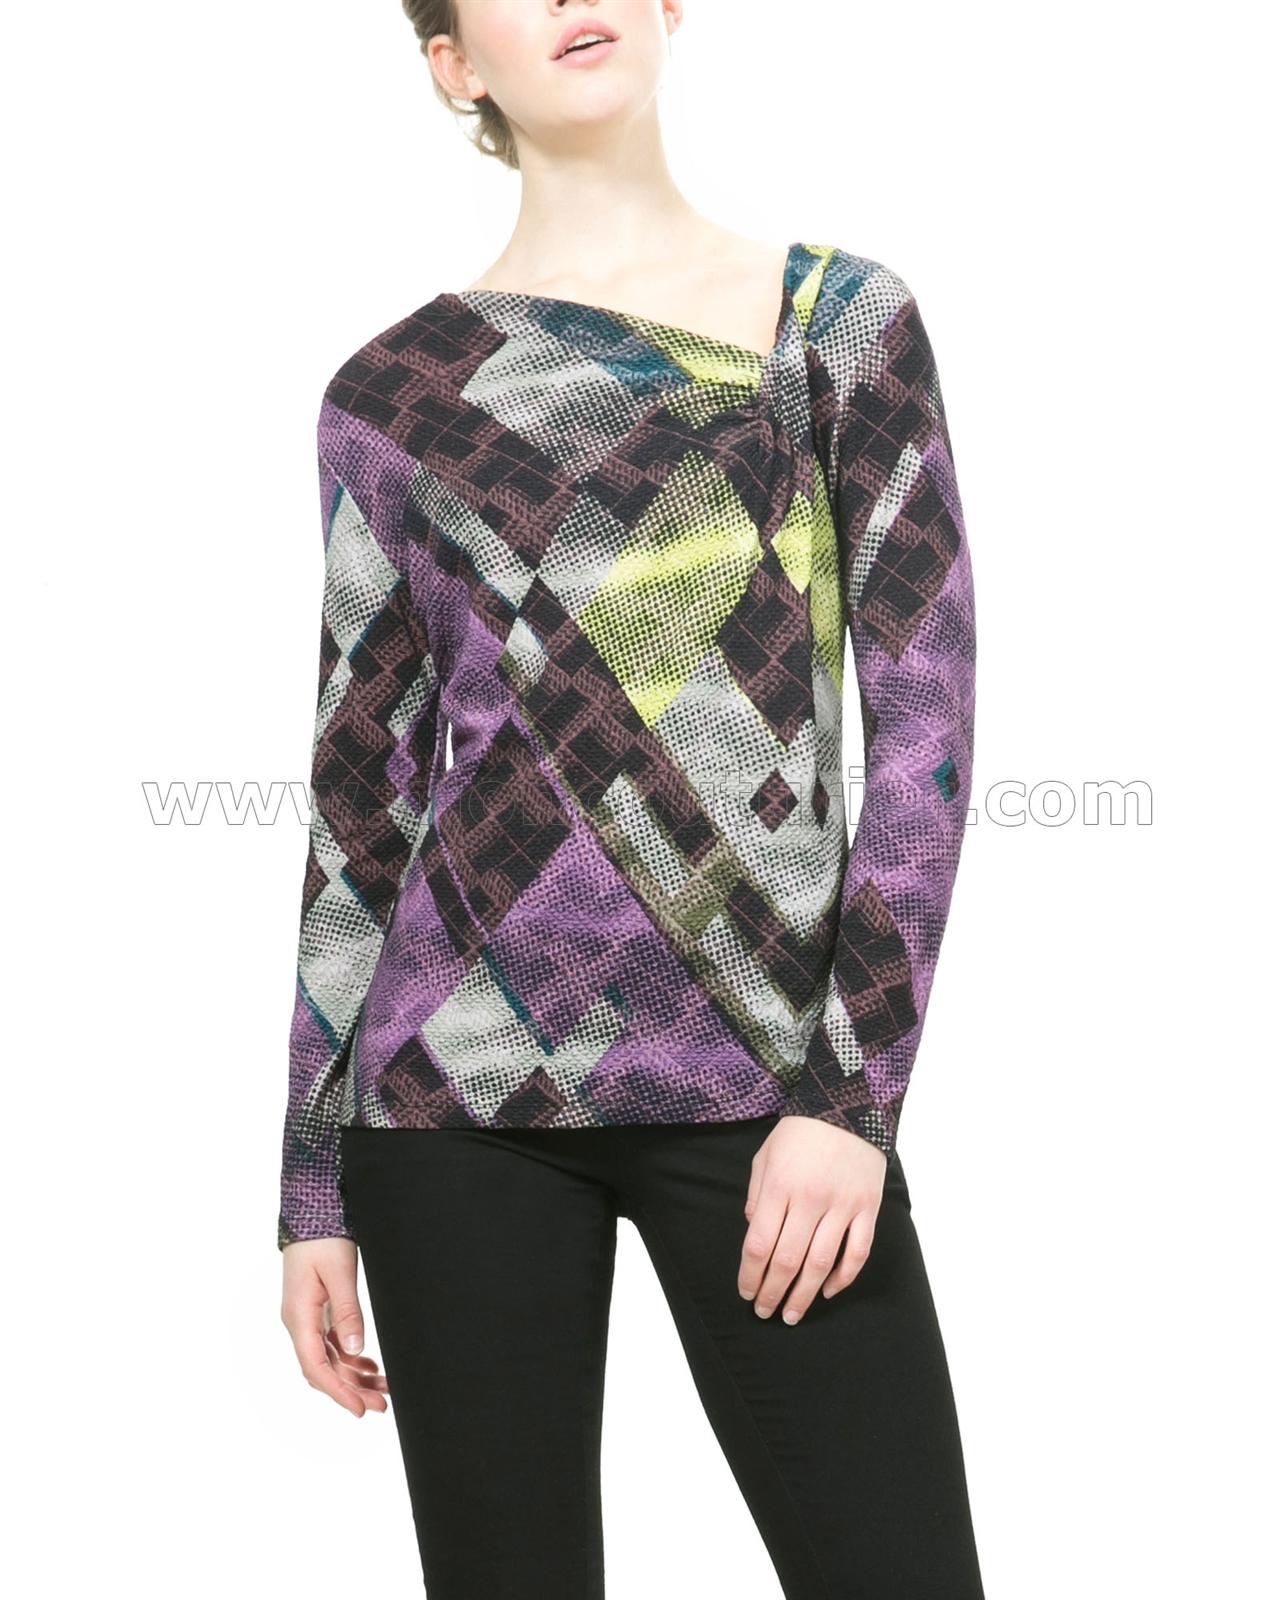 desigual womens 39 t shirt margarita. Black Bedroom Furniture Sets. Home Design Ideas